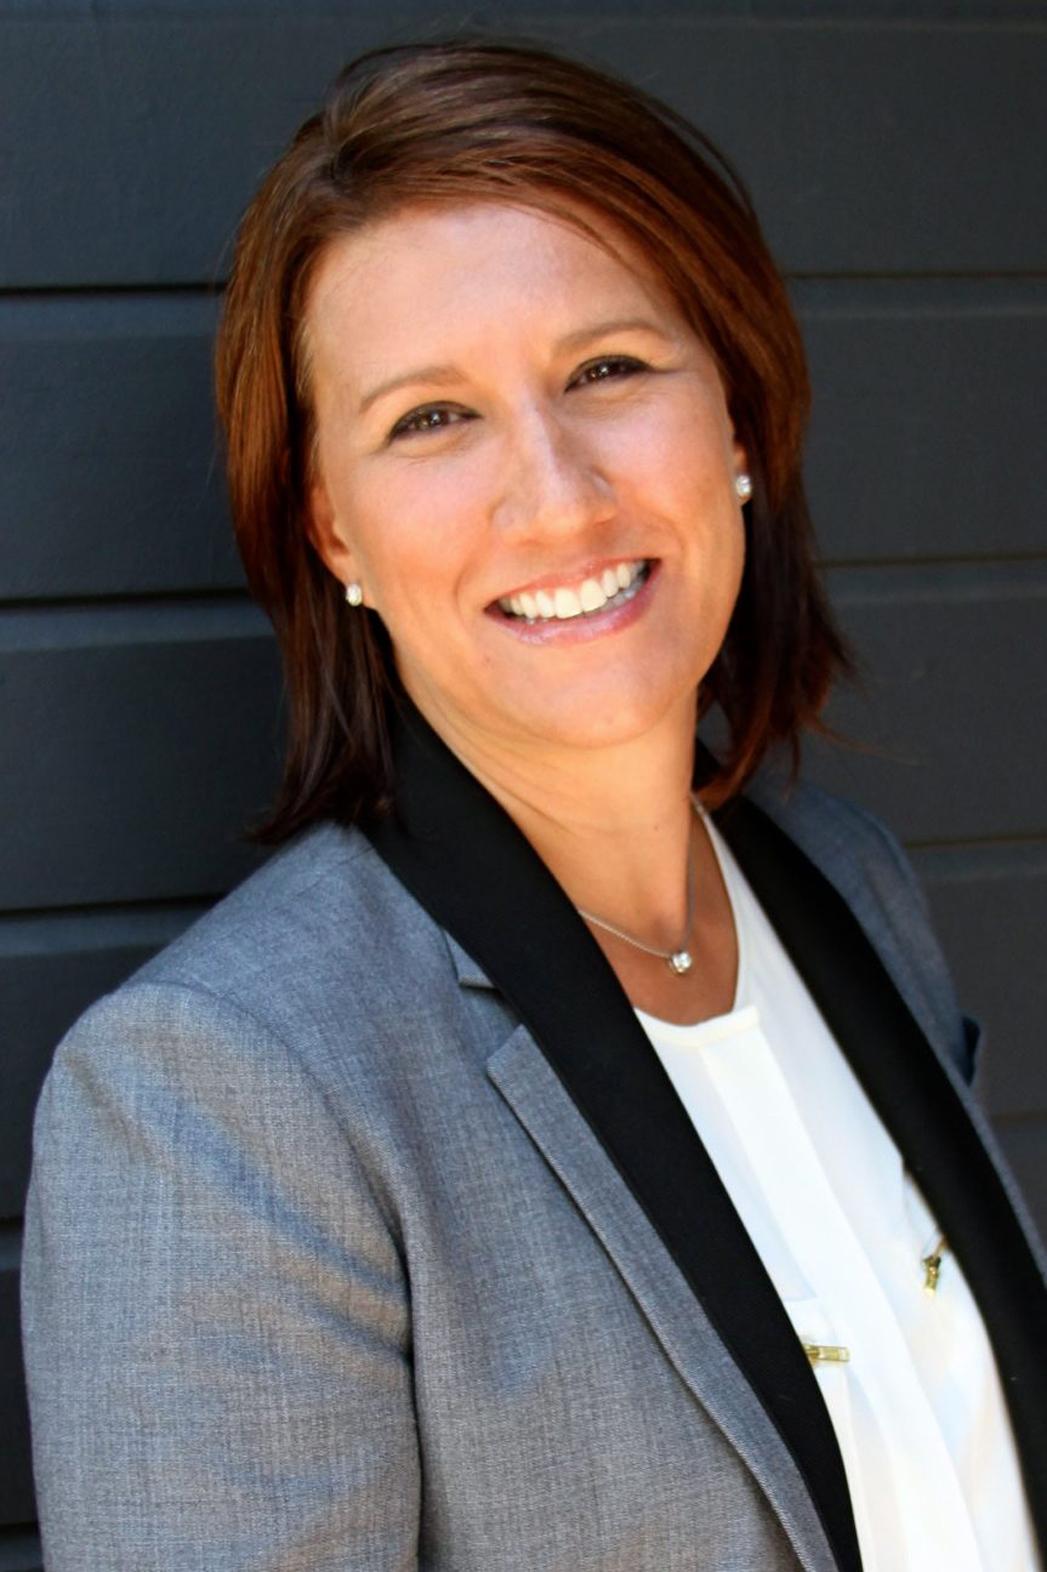 Jenny Wall, Advancing Women Executives Leader